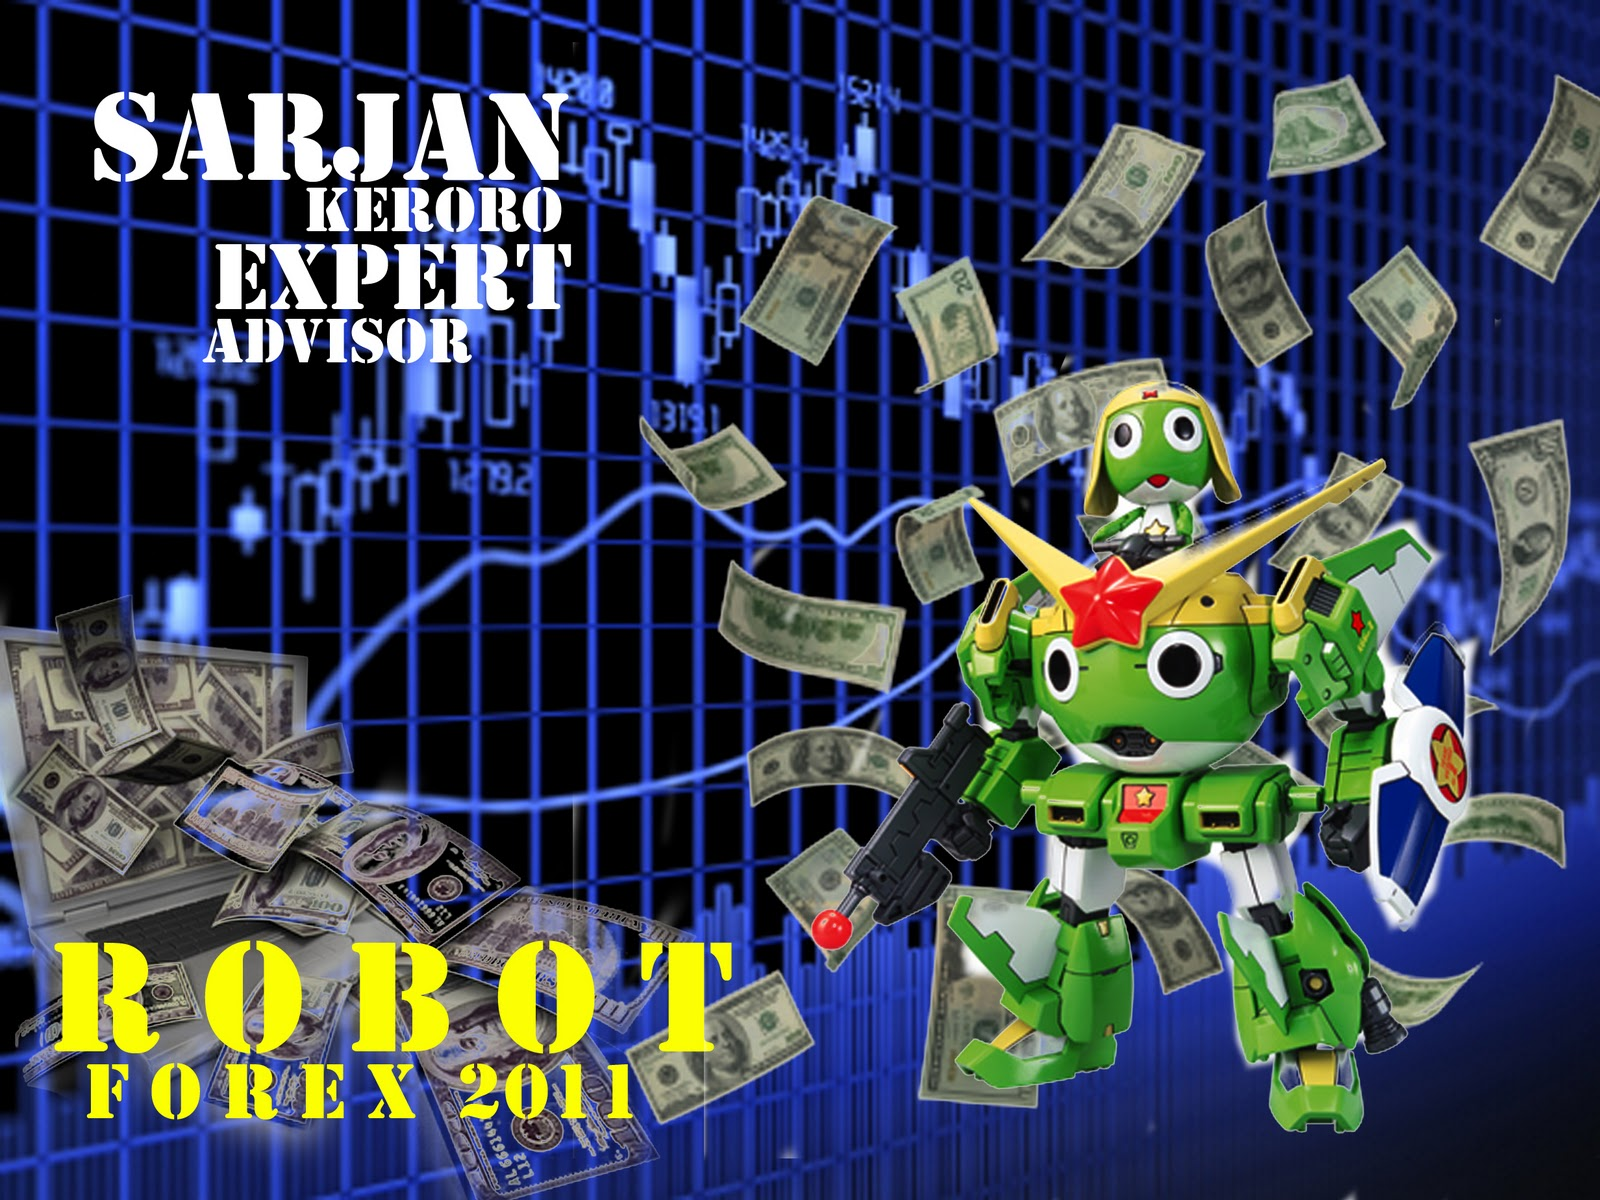 Robot forex 2015 profesional